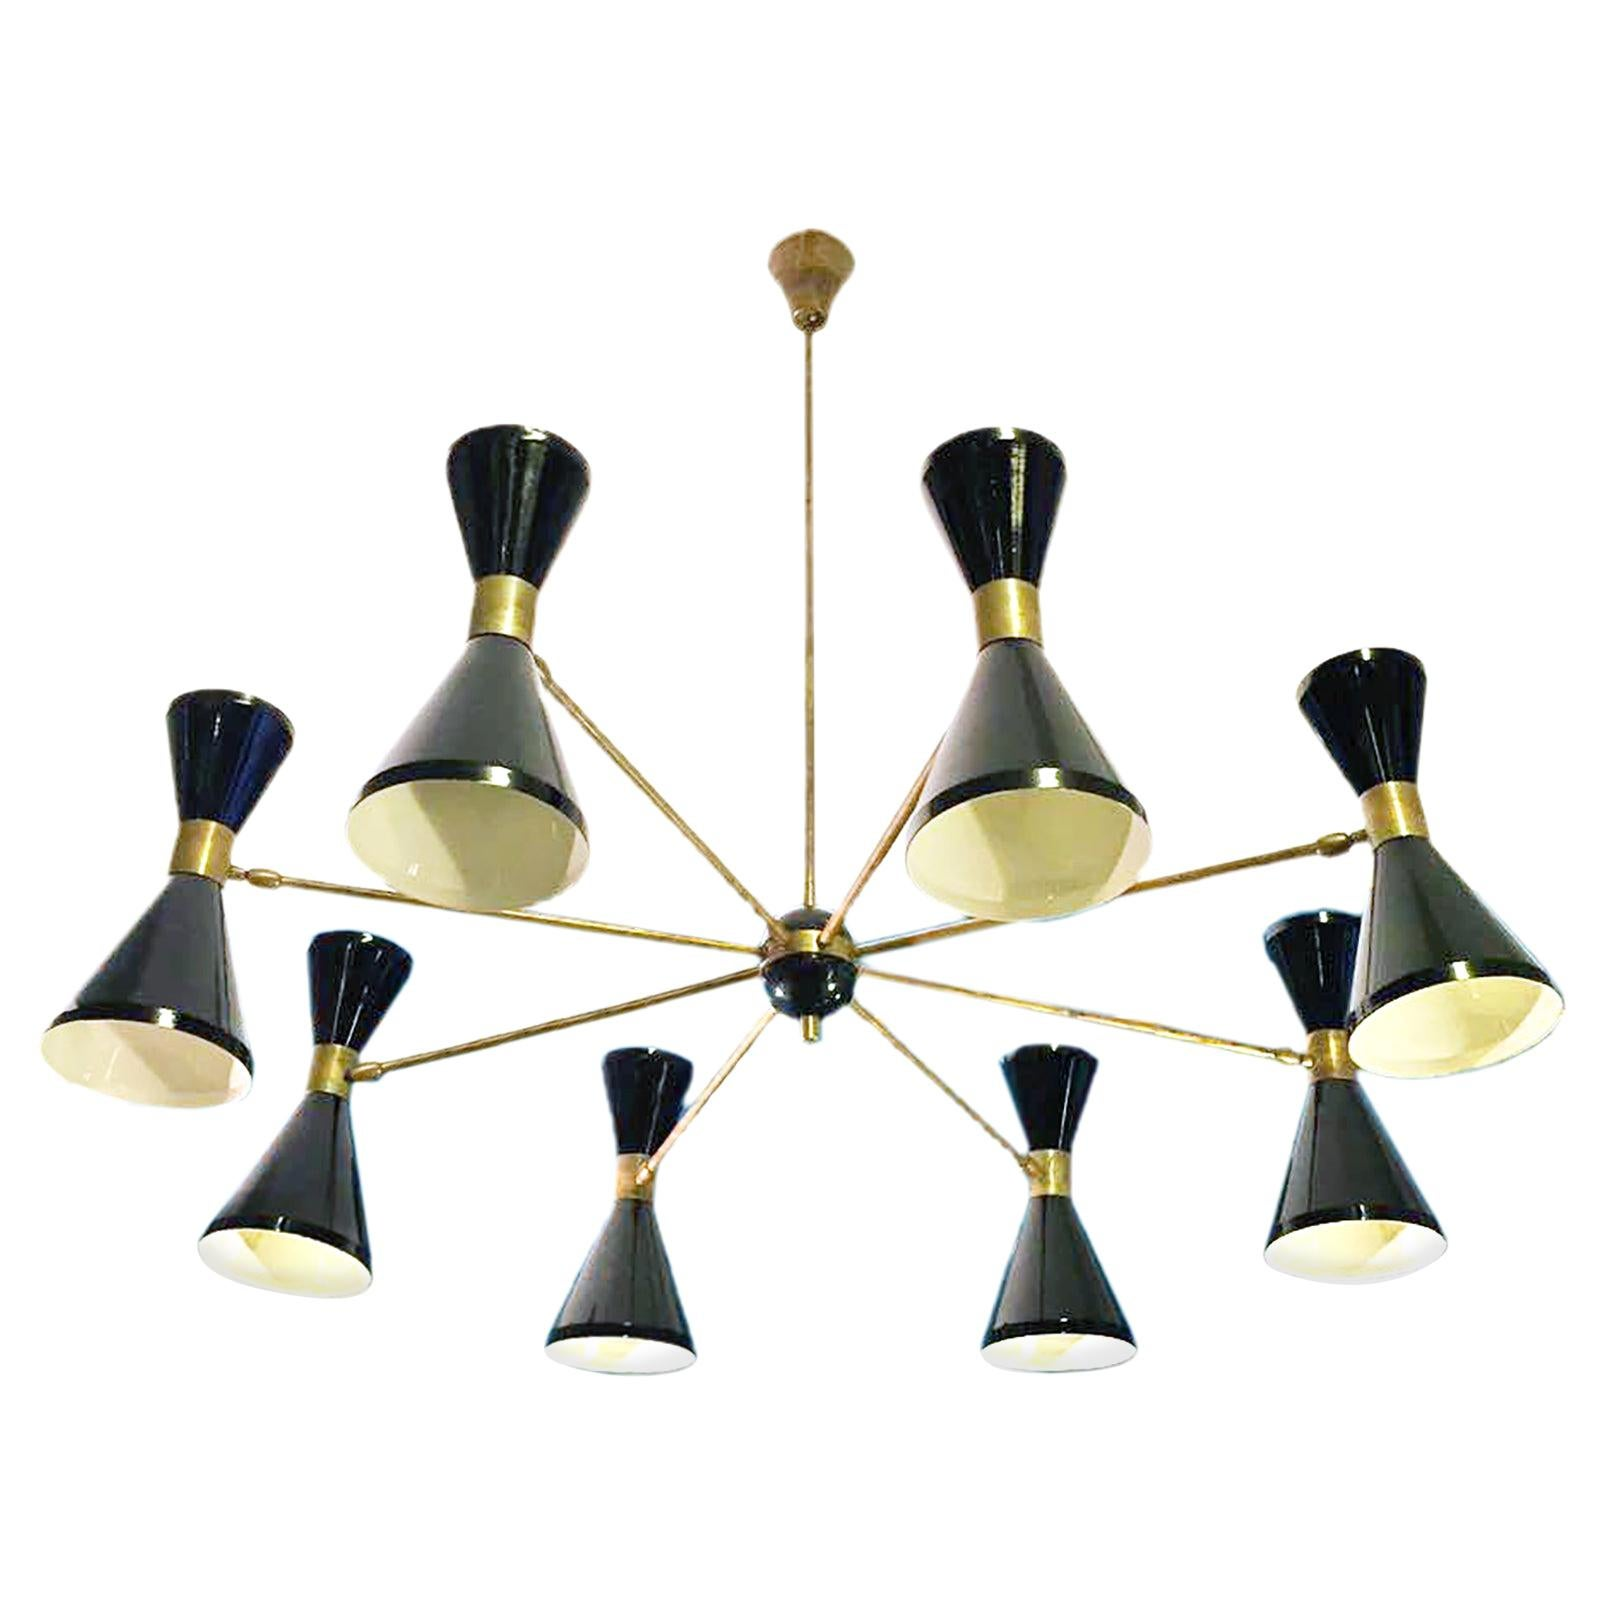 Eight Arms Brass Chandelier, Pivot Shades, Stilnovo Style, Sixteen Bulbs